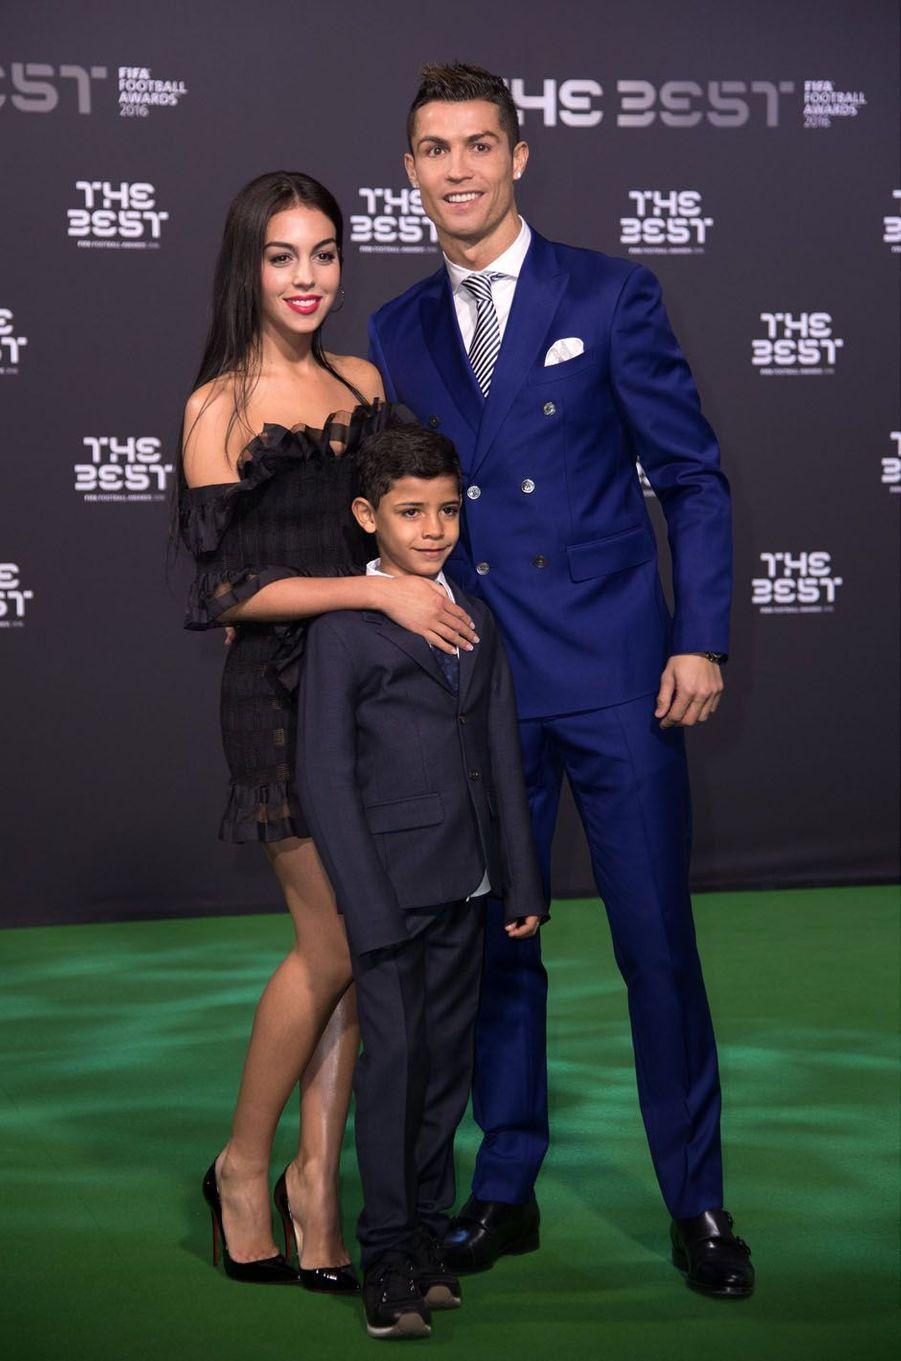 Cristiano Ronaldo, Georgina Rodriguez et Cristiano Junior à Zurich pour la remise des prix Fifa, le 9 janvier 2017.